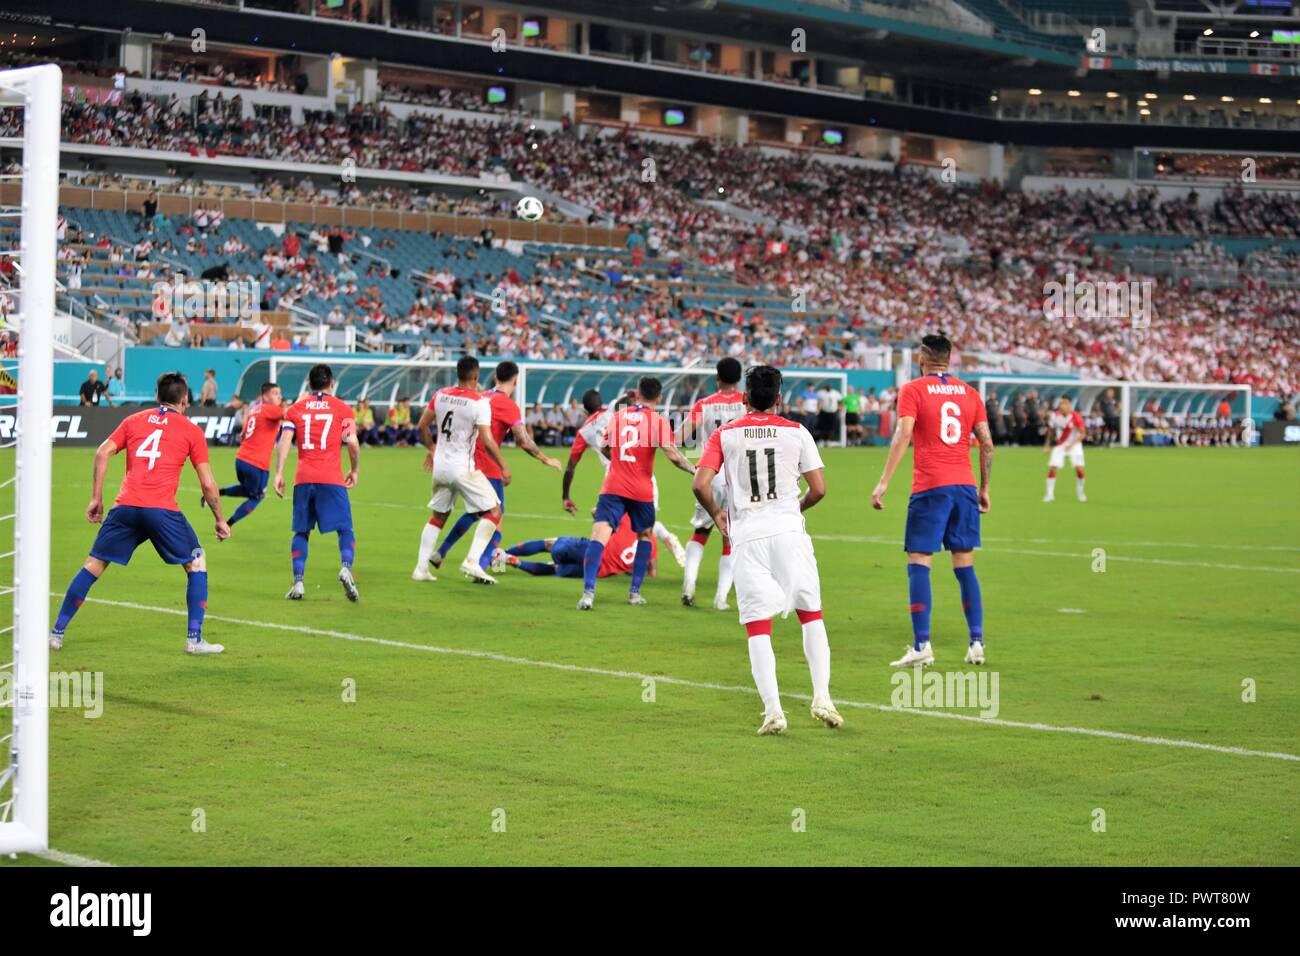 Miami, Florida. 12th Oct, 2018. SOCCER GAME, Chile vs Peru at Hard Rock Stadium in Miami, Florida. Oct 12, 2018. Peru won 3-0. - Stock Image